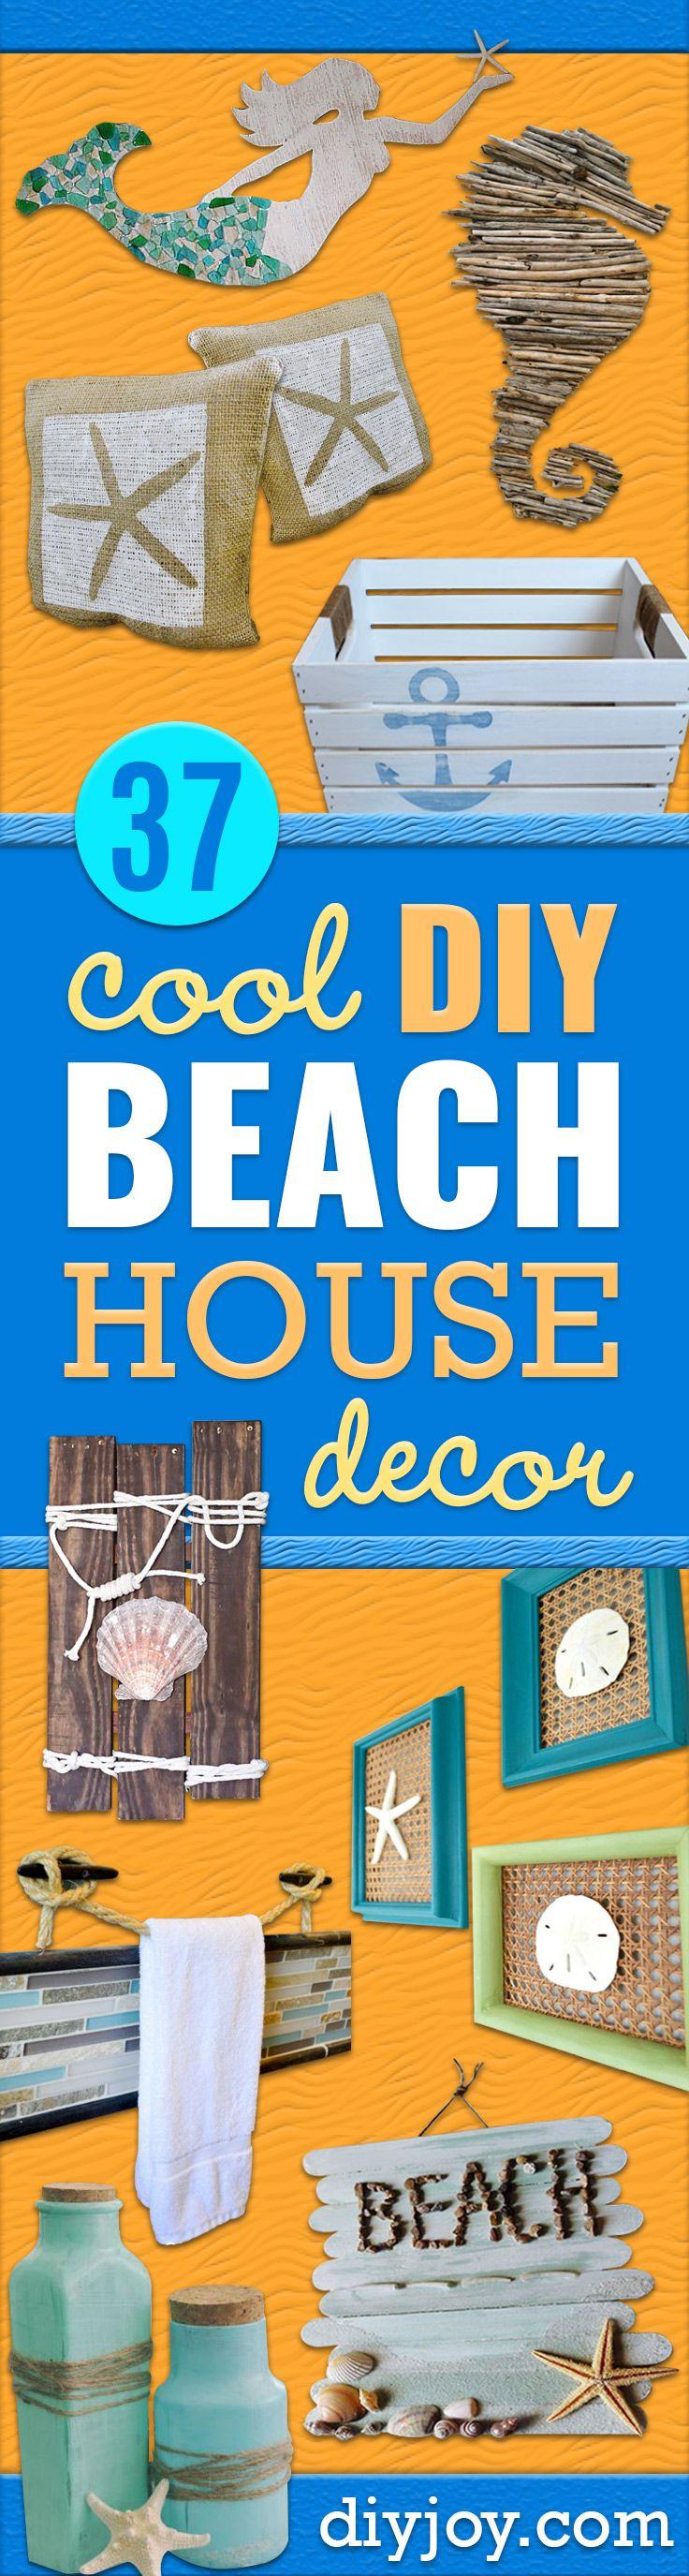 2527 best diy crafts images on pinterest artesana artesanas 37 best diy beach house decor ideas solutioingenieria Choice Image